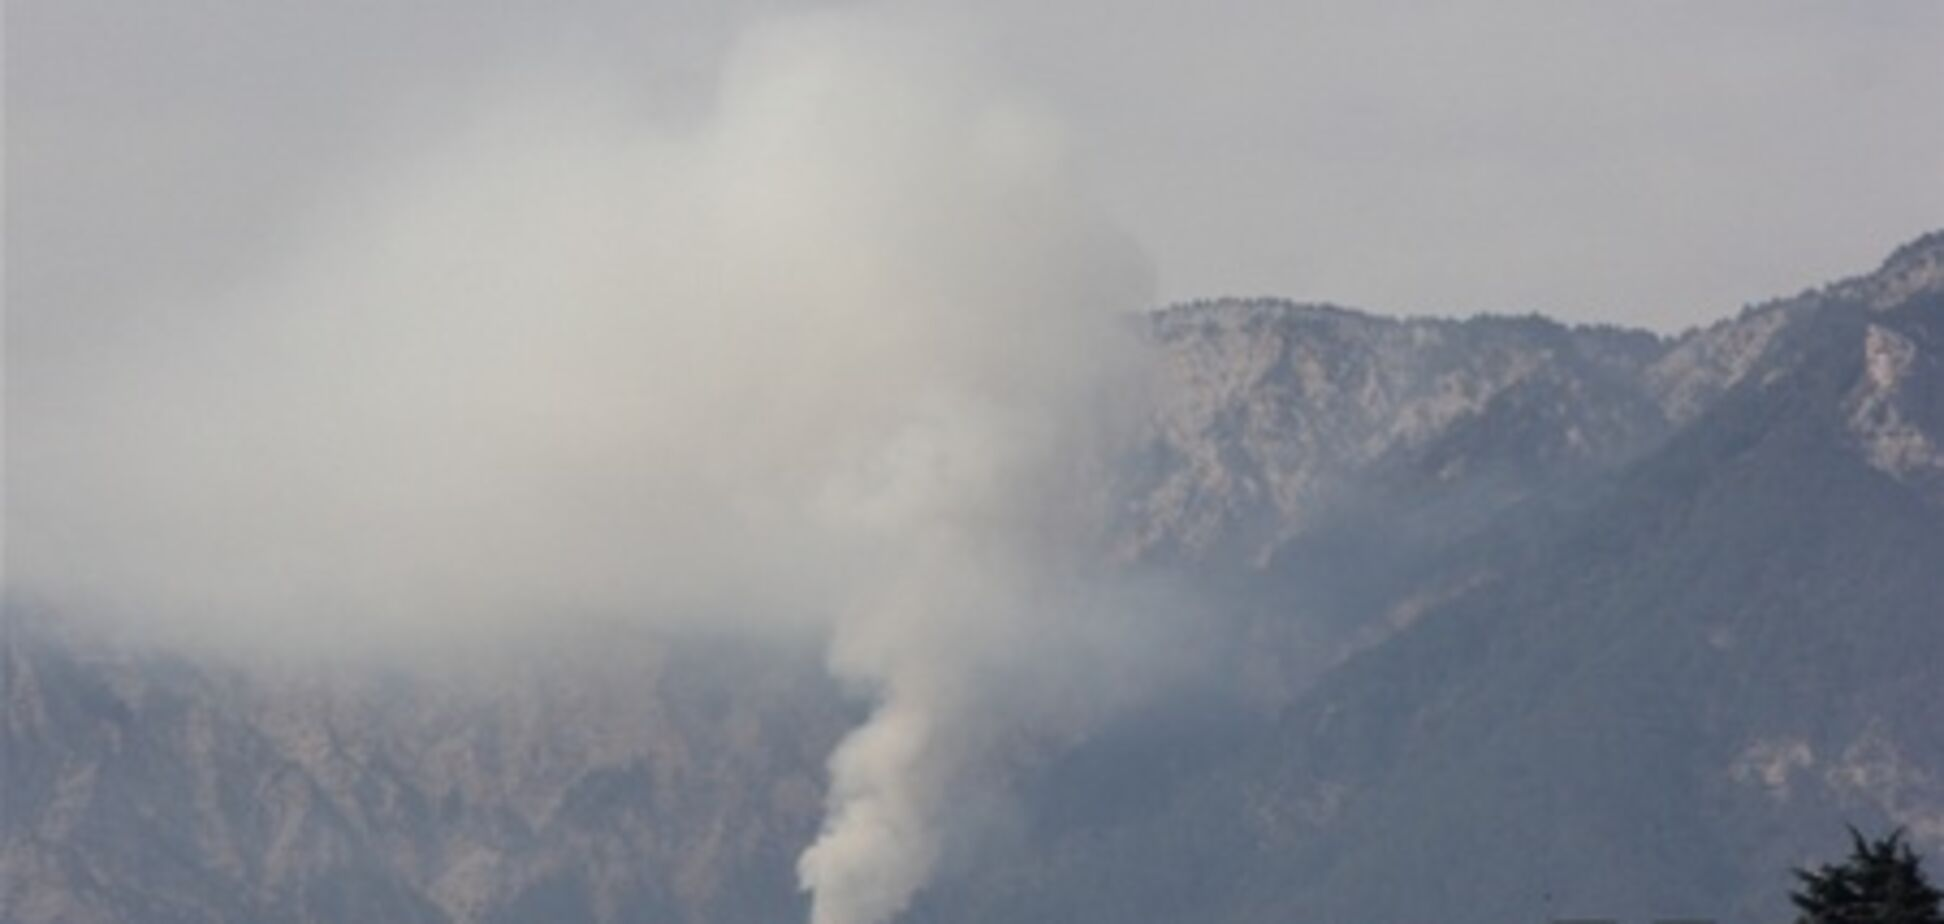 Вблизи Ялты горит лес